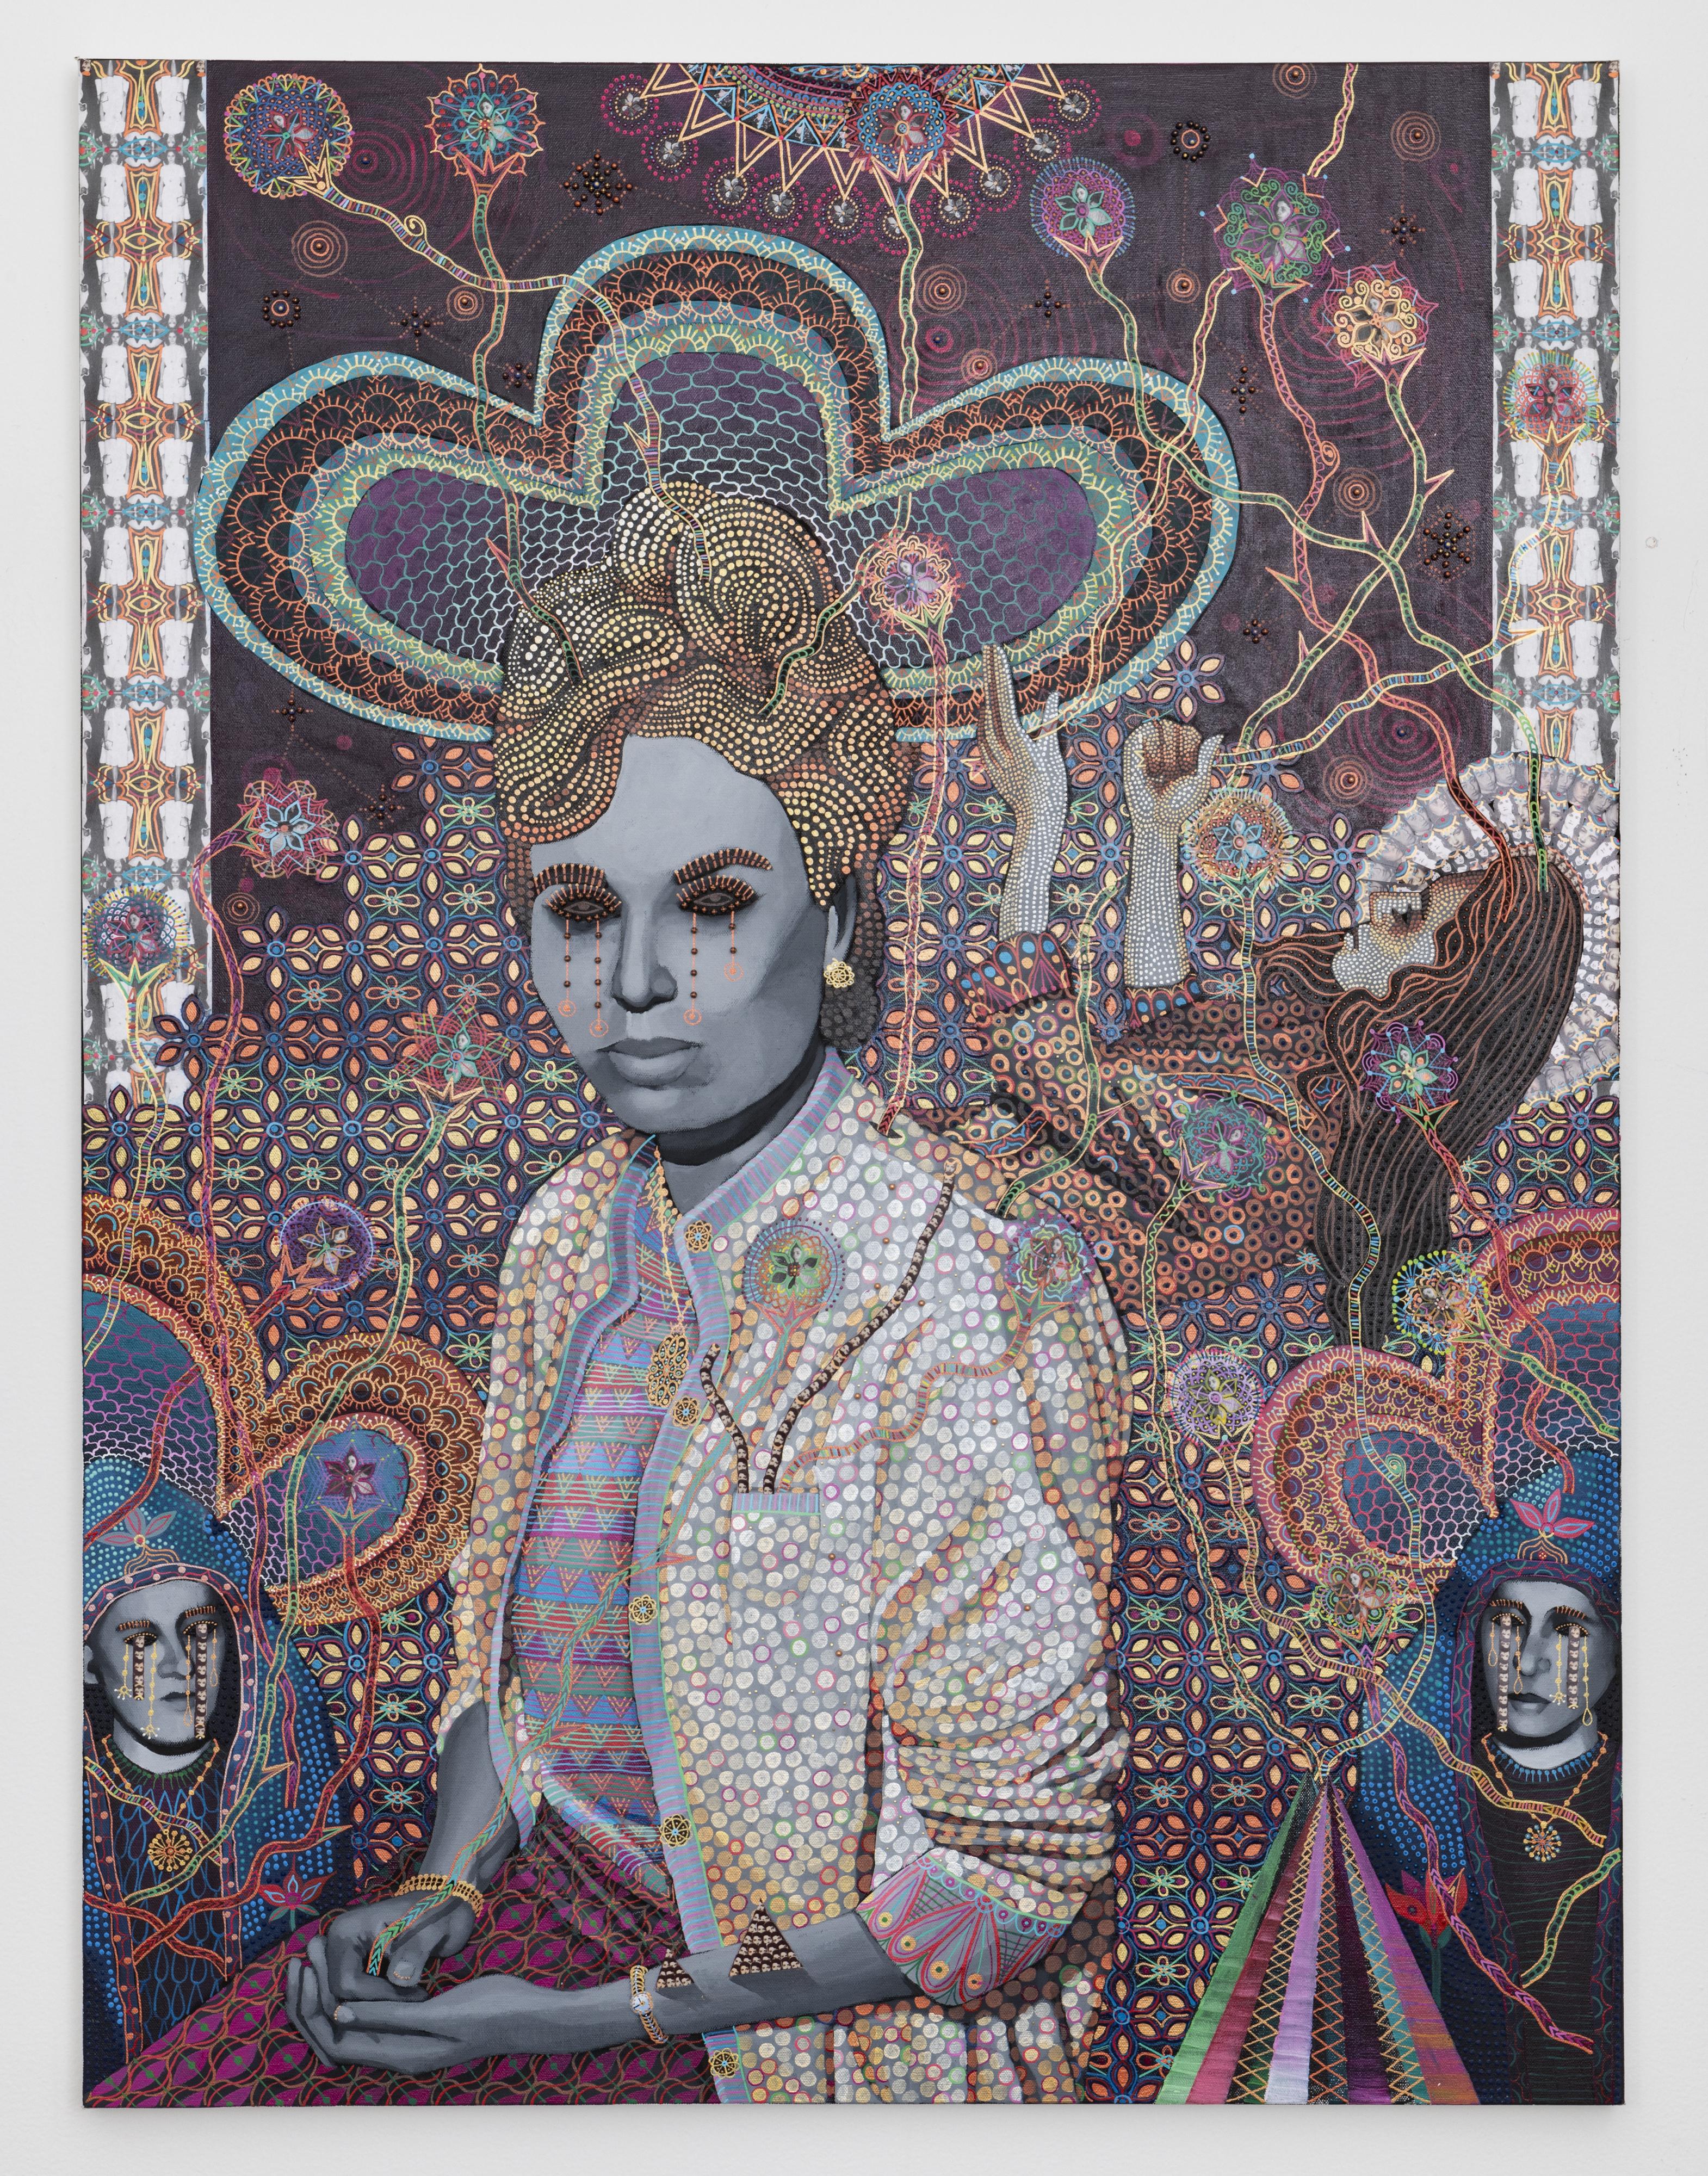 Les Femmes D'Alger #87, 2020